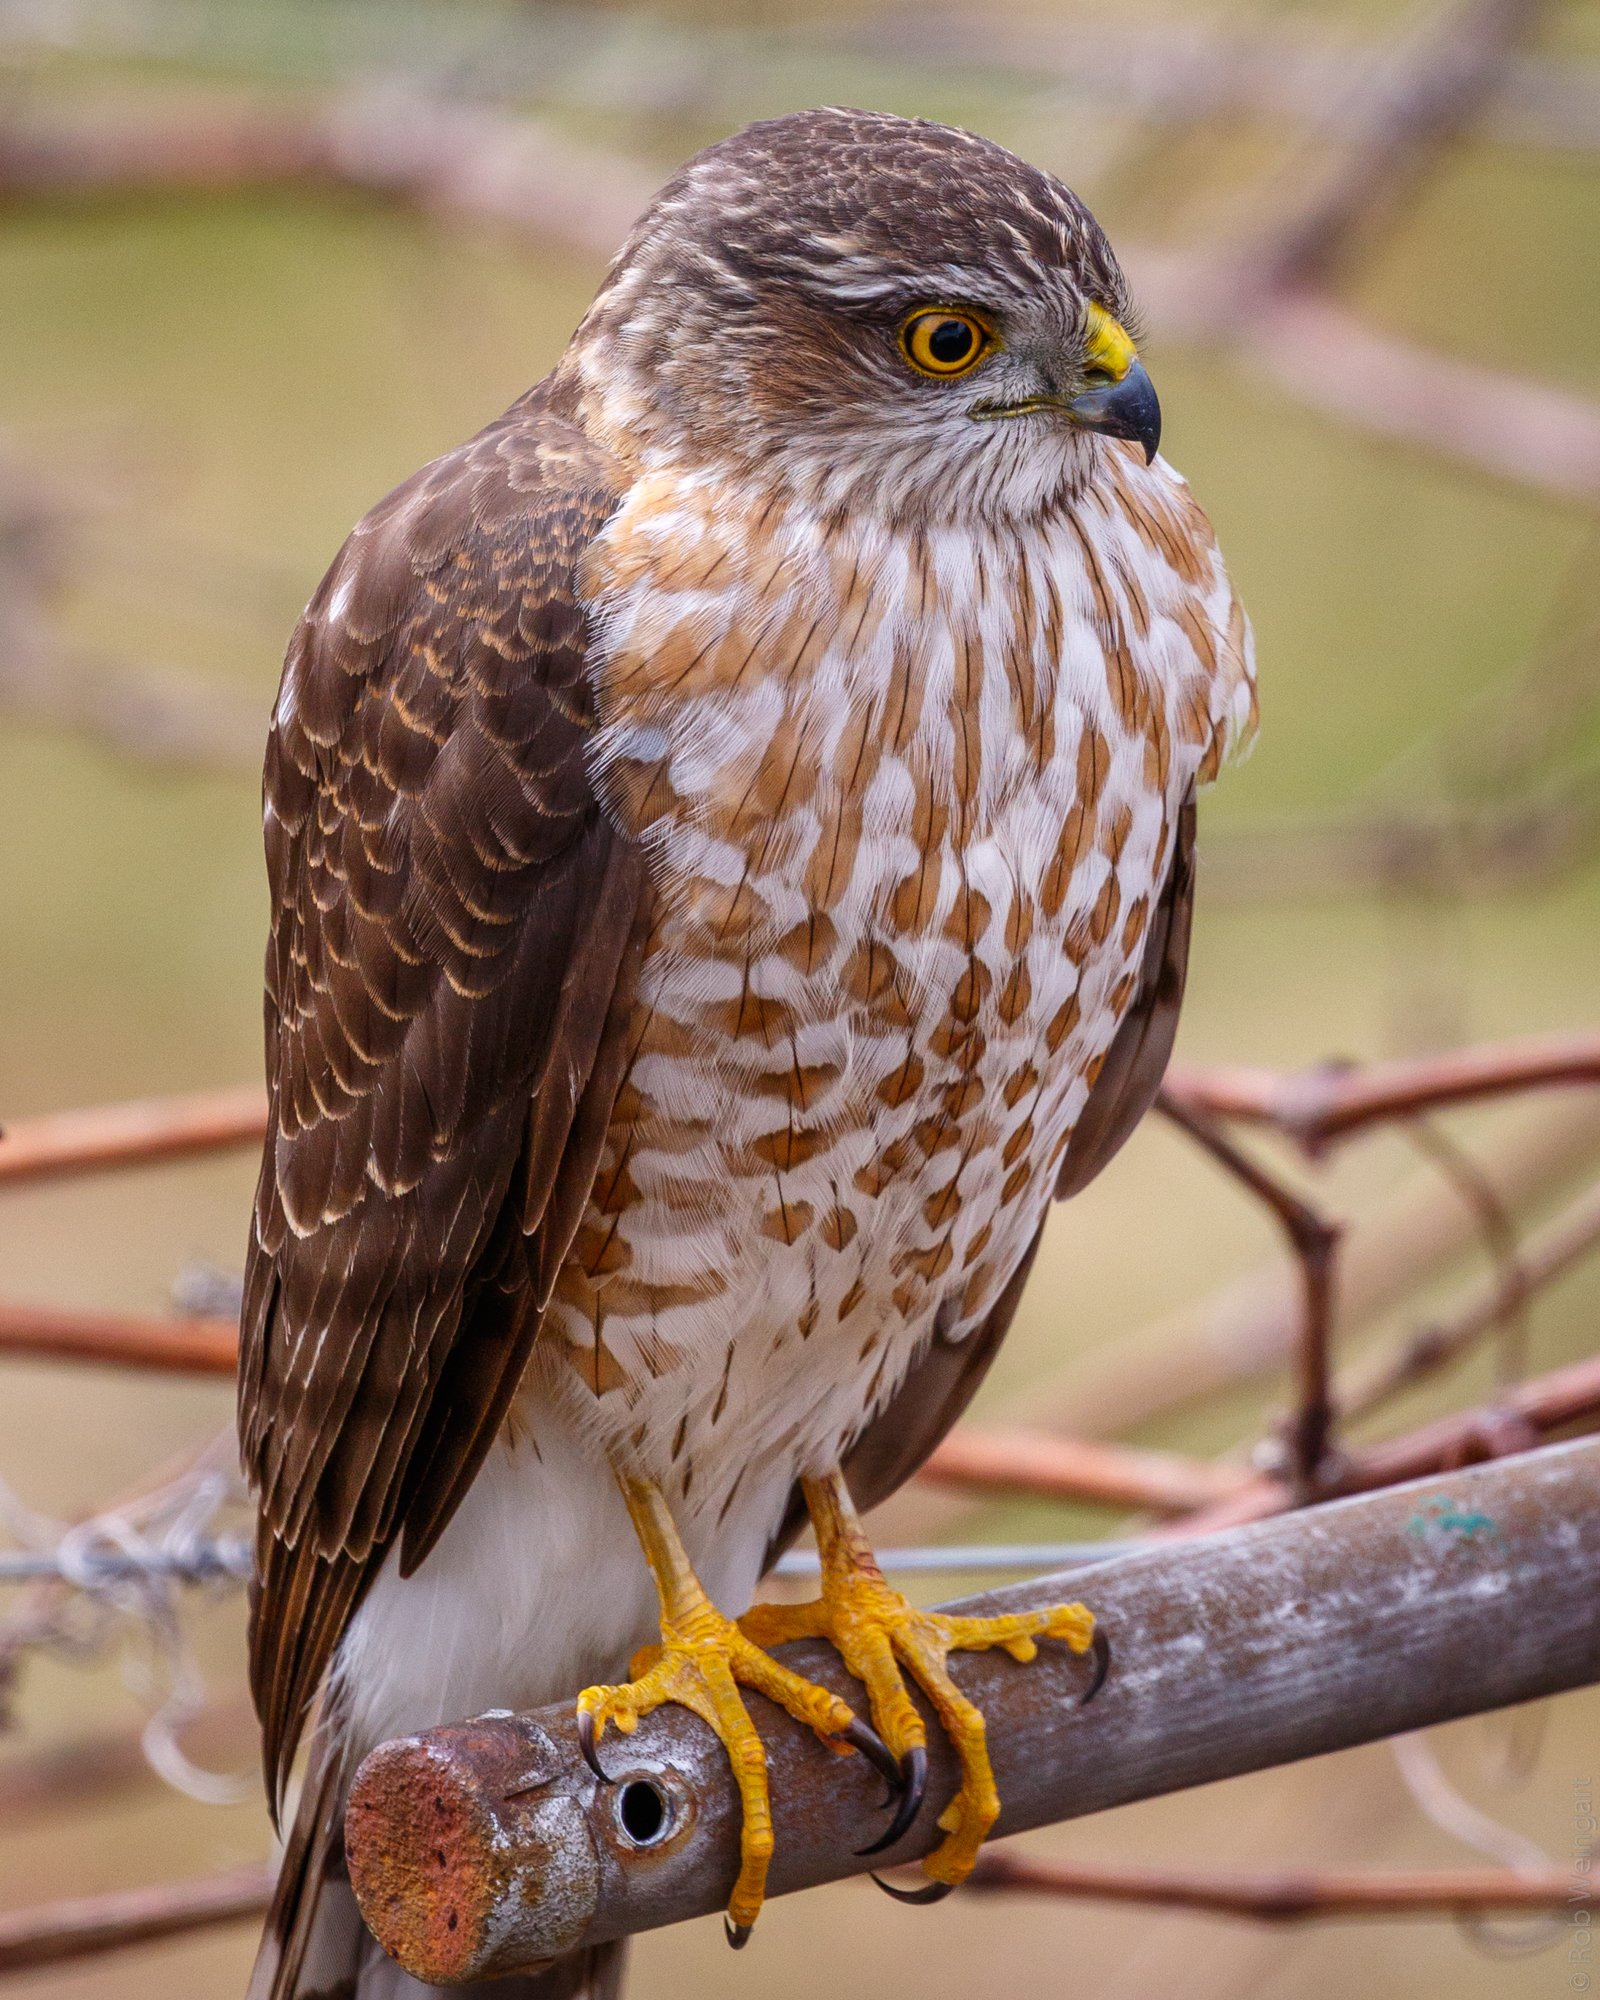 wildlife_photography_19.jpg